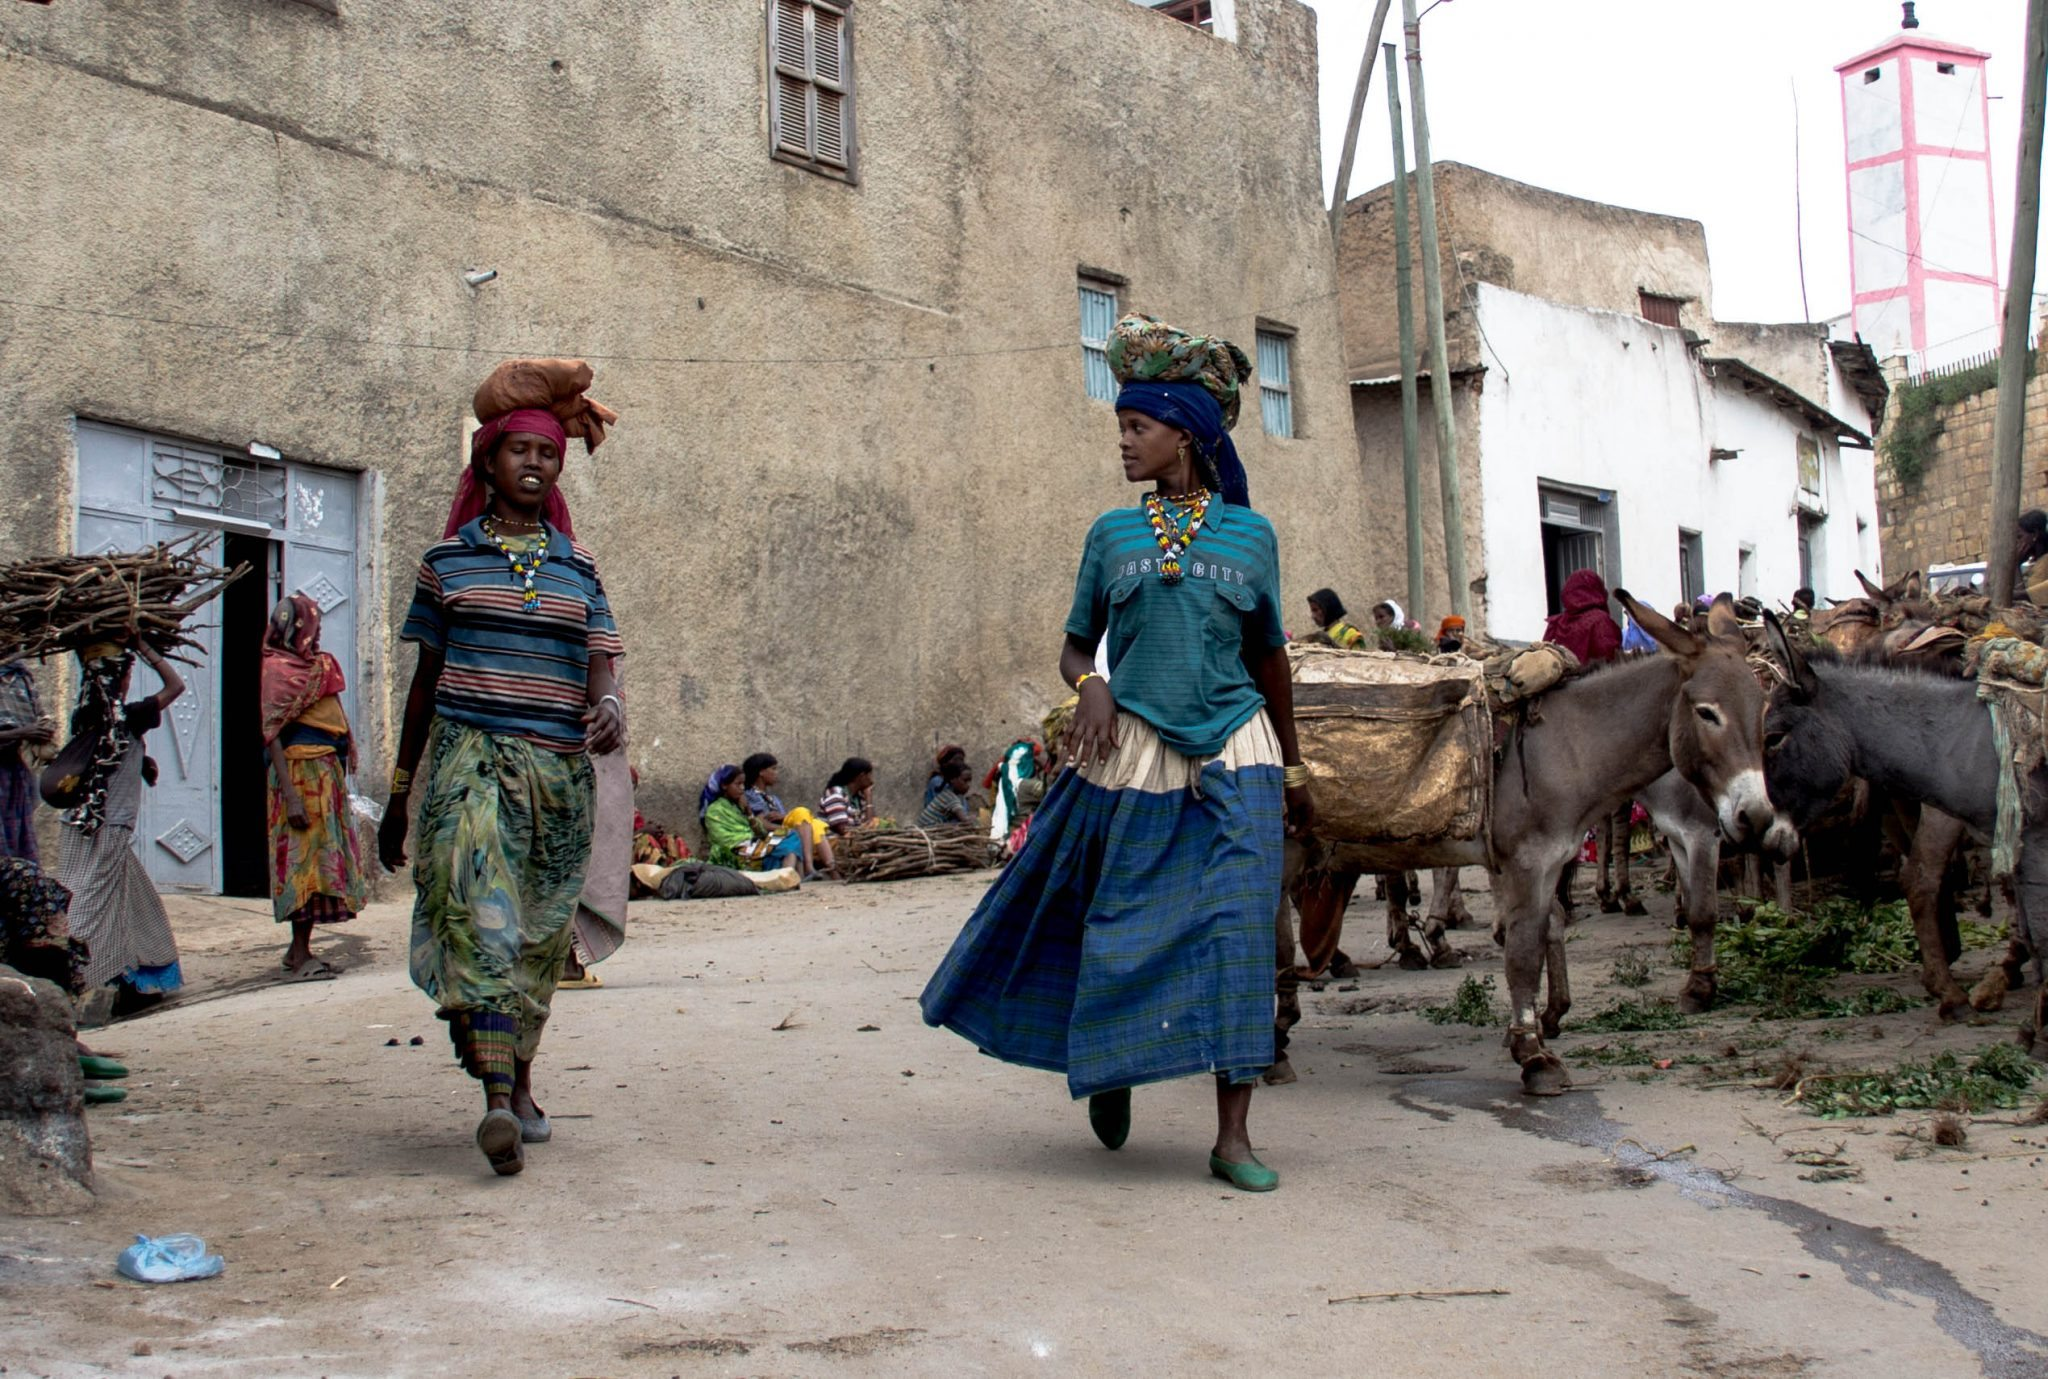 Etiopia, Harar